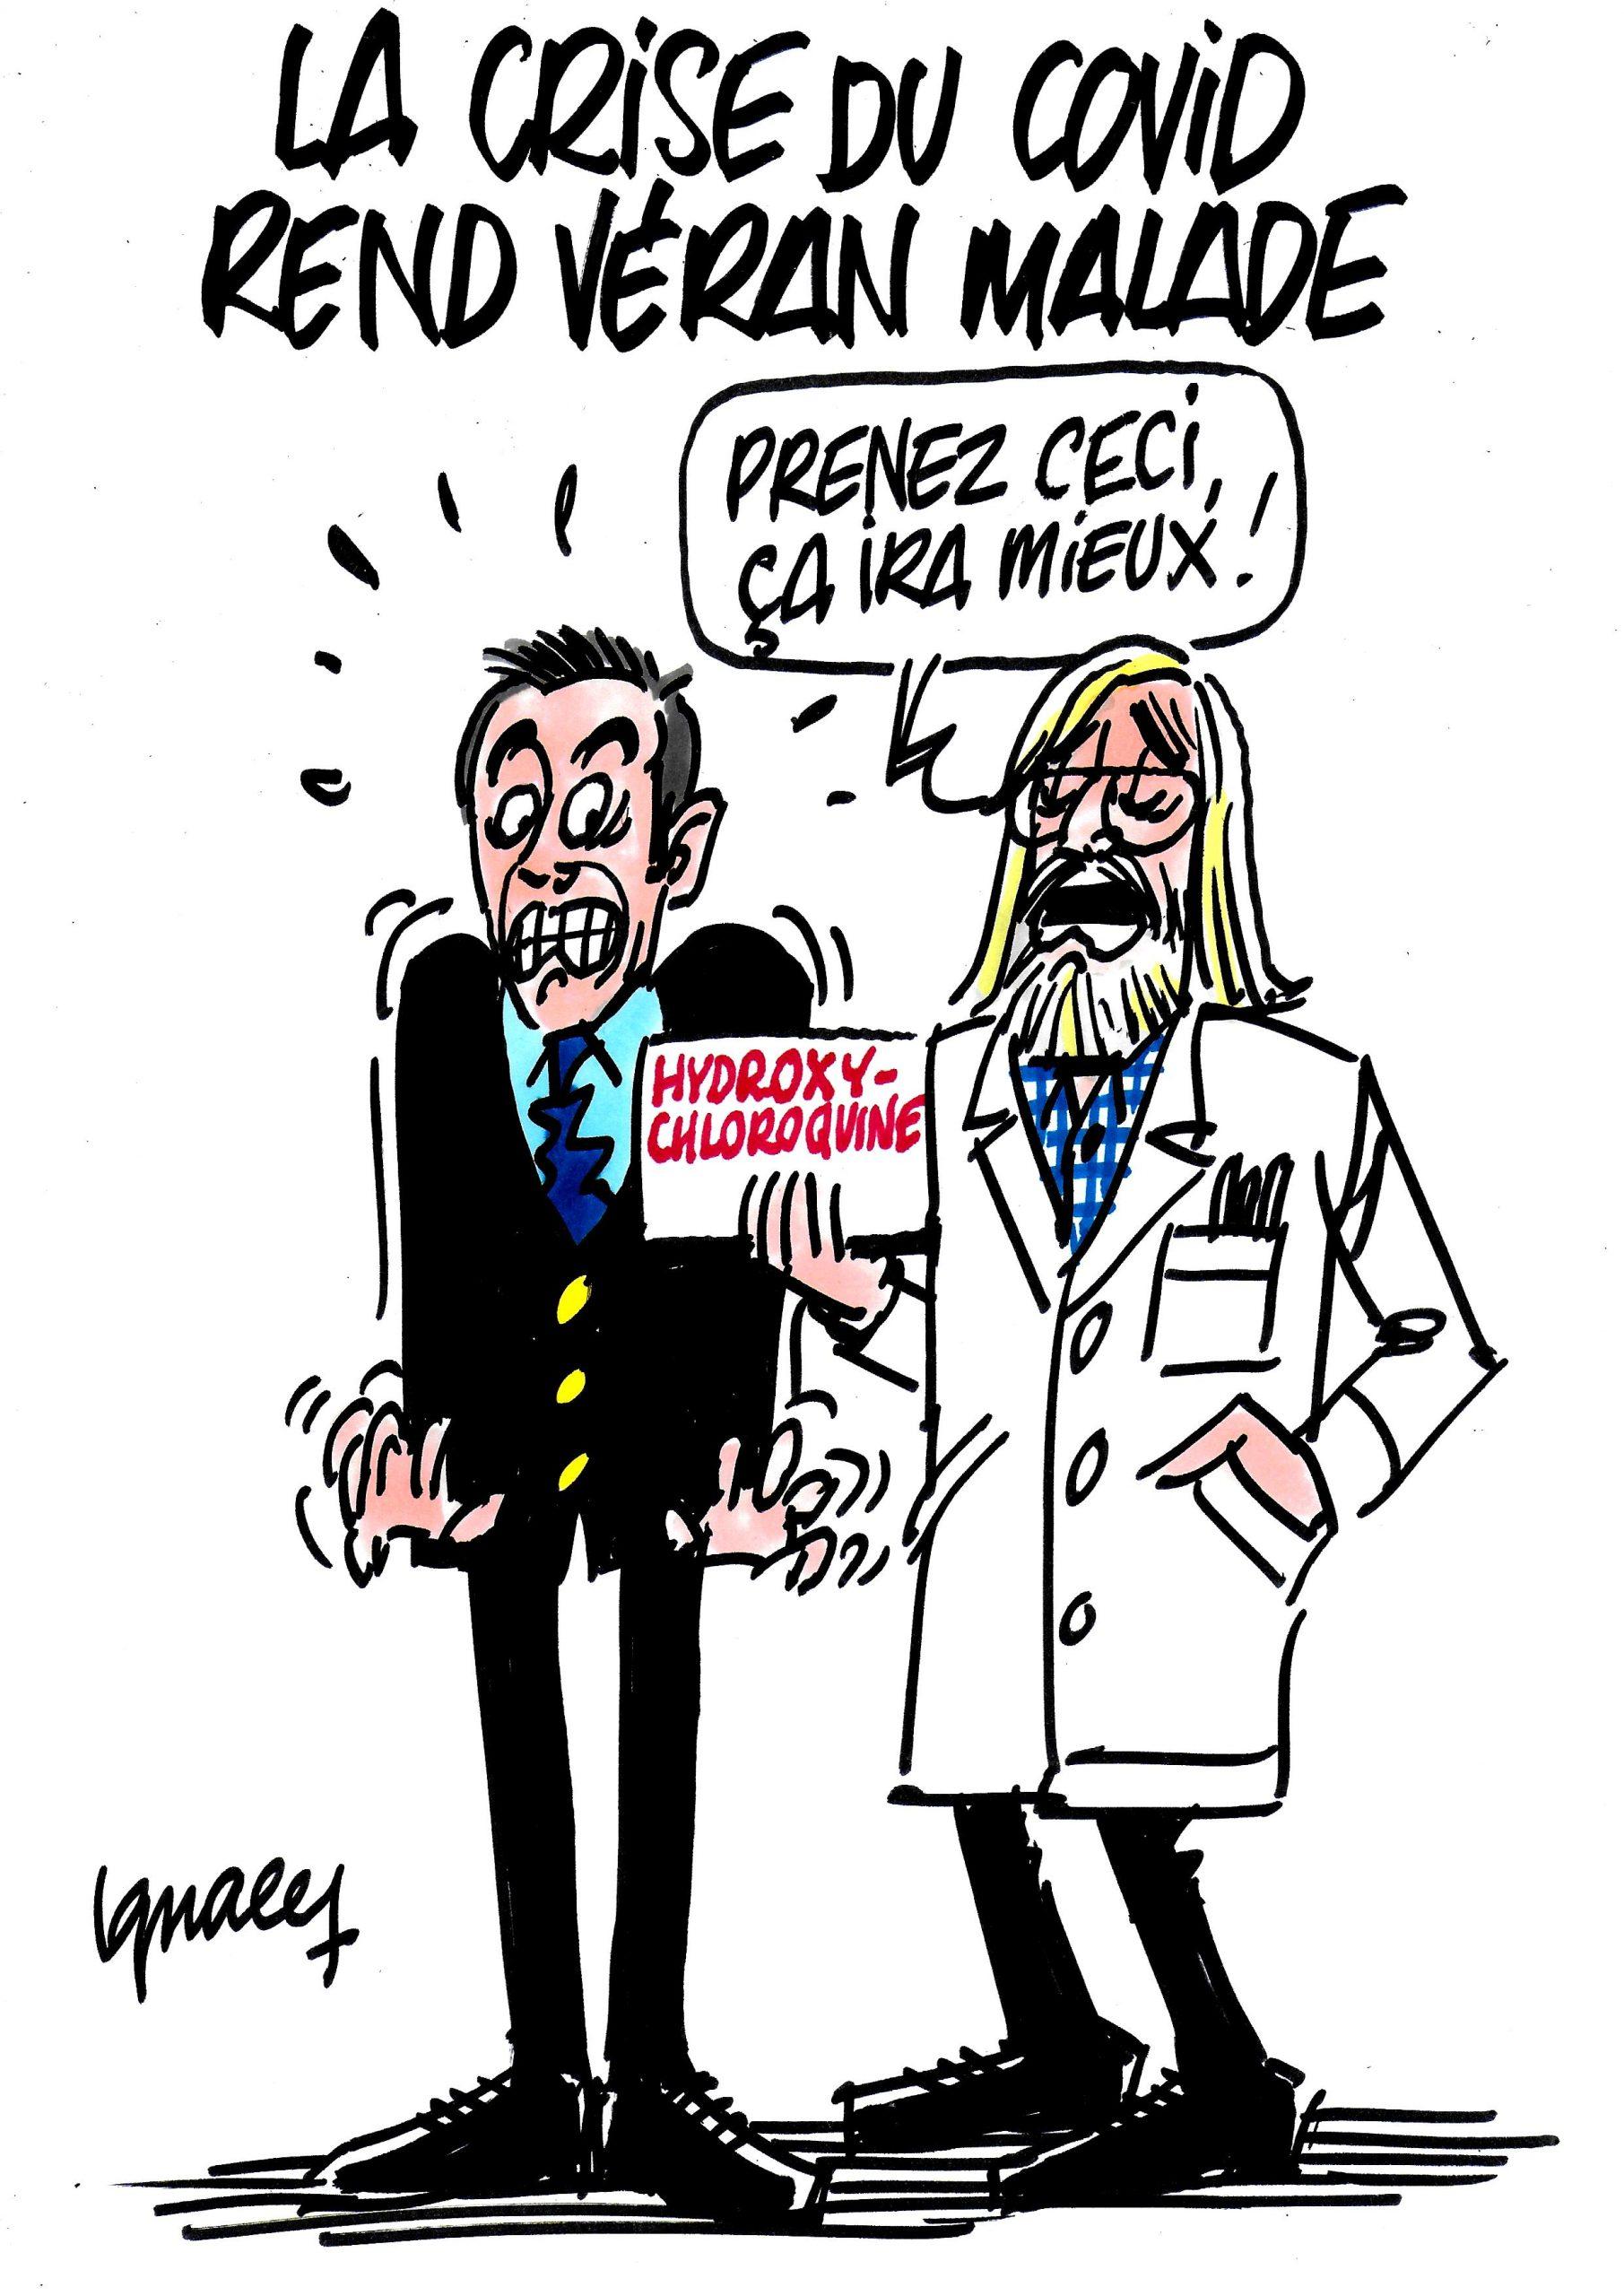 Ignace - La crise du covid rend Véran malade